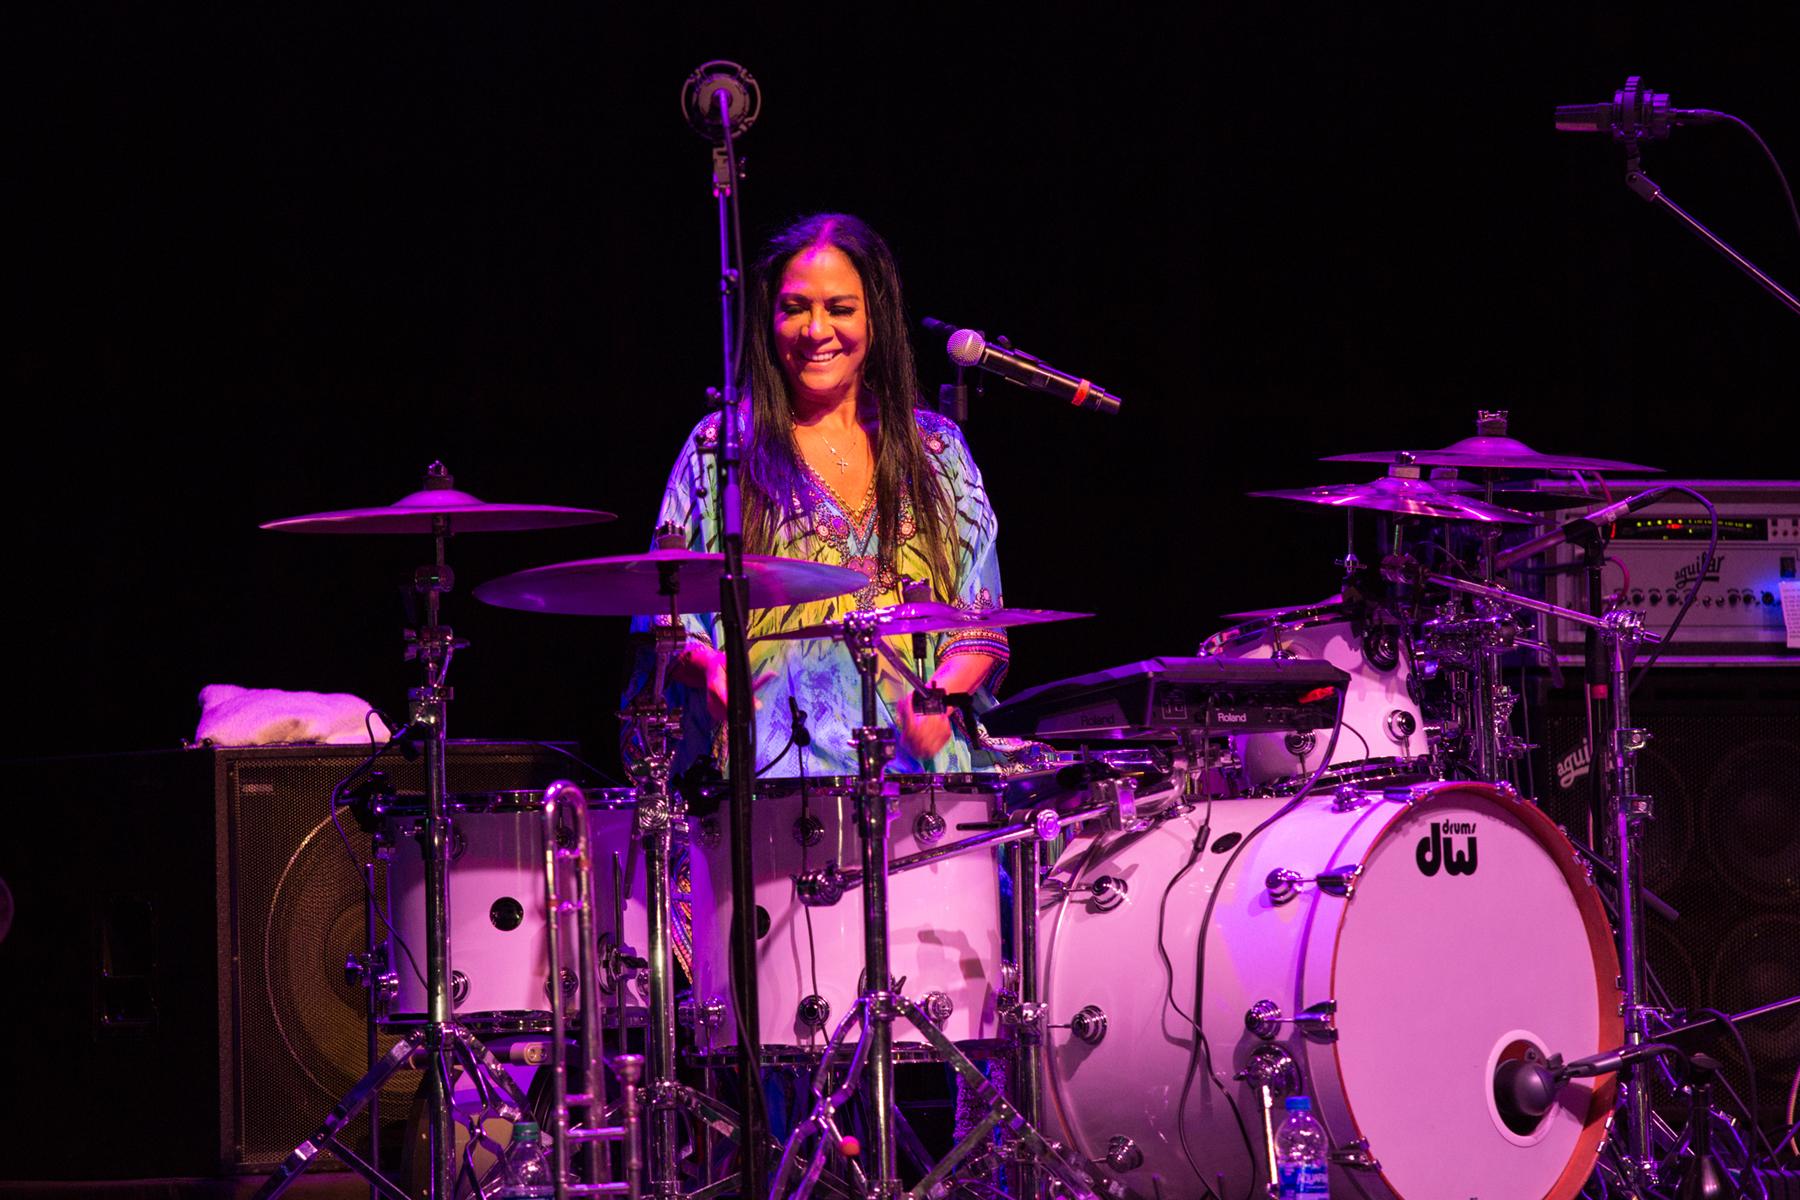 Sheila Drumset Smiling2.jpg